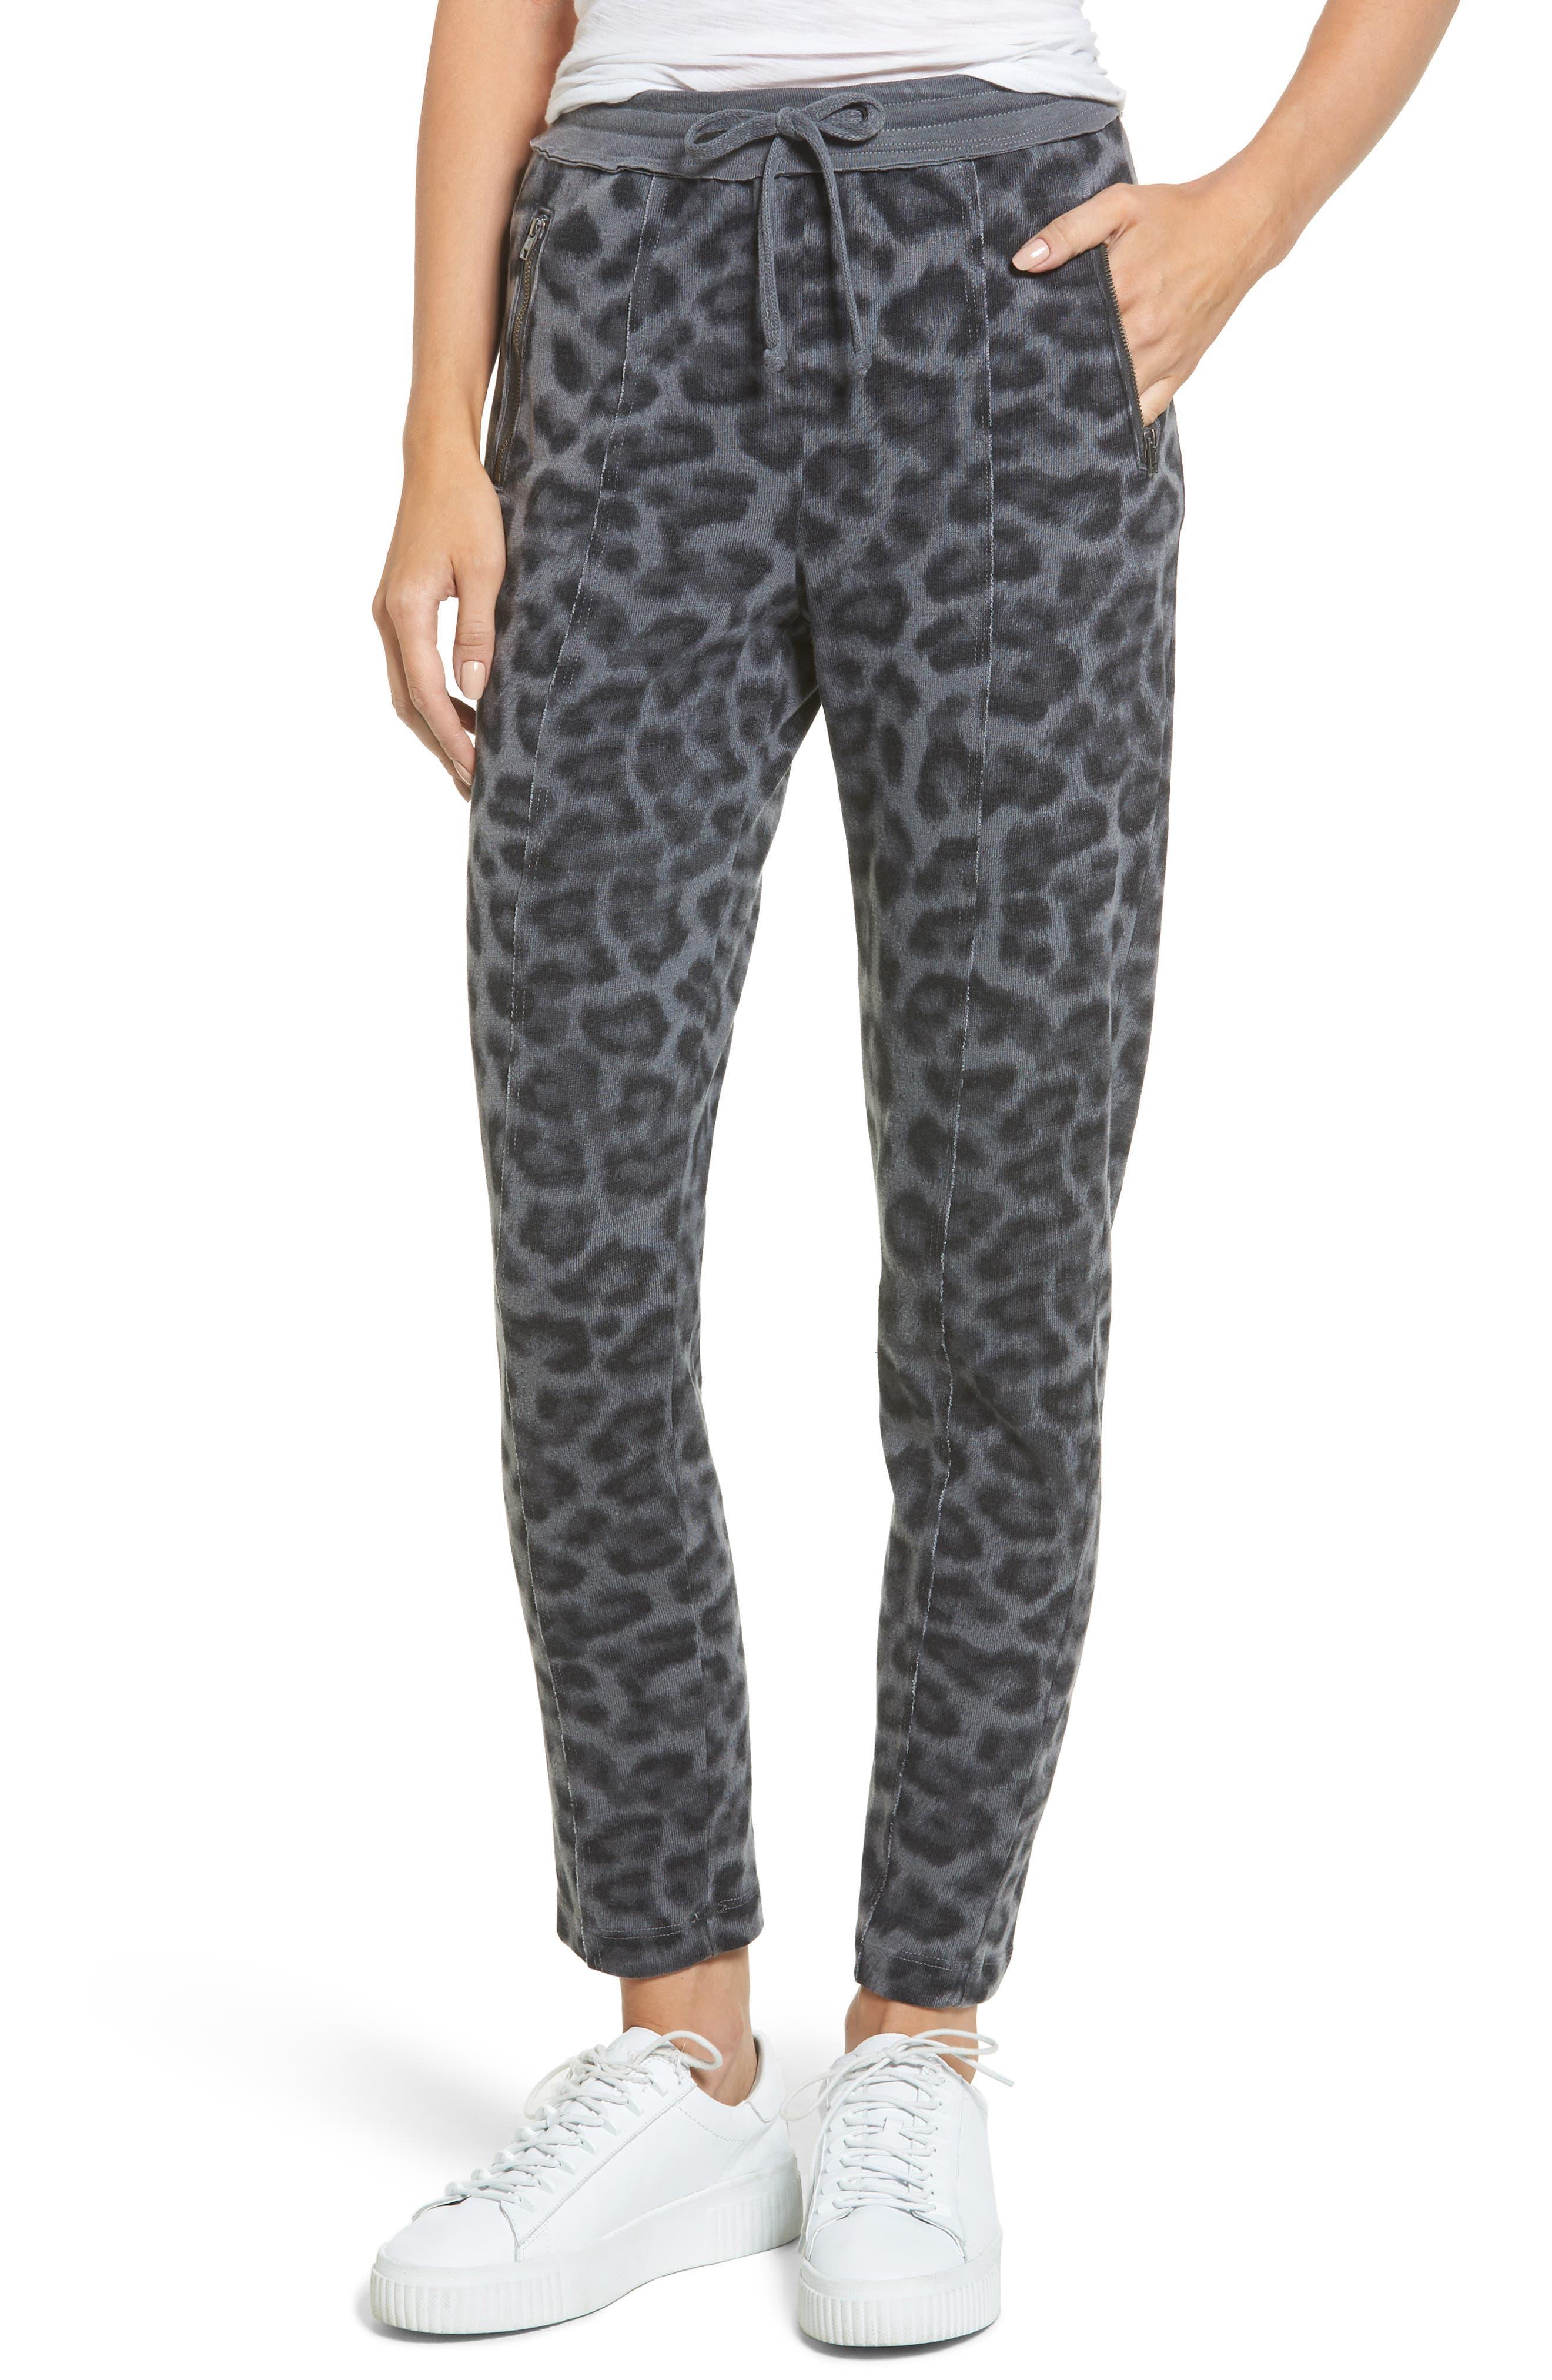 Leopard Print Jogger Pants,                             Main thumbnail 1, color,                             032